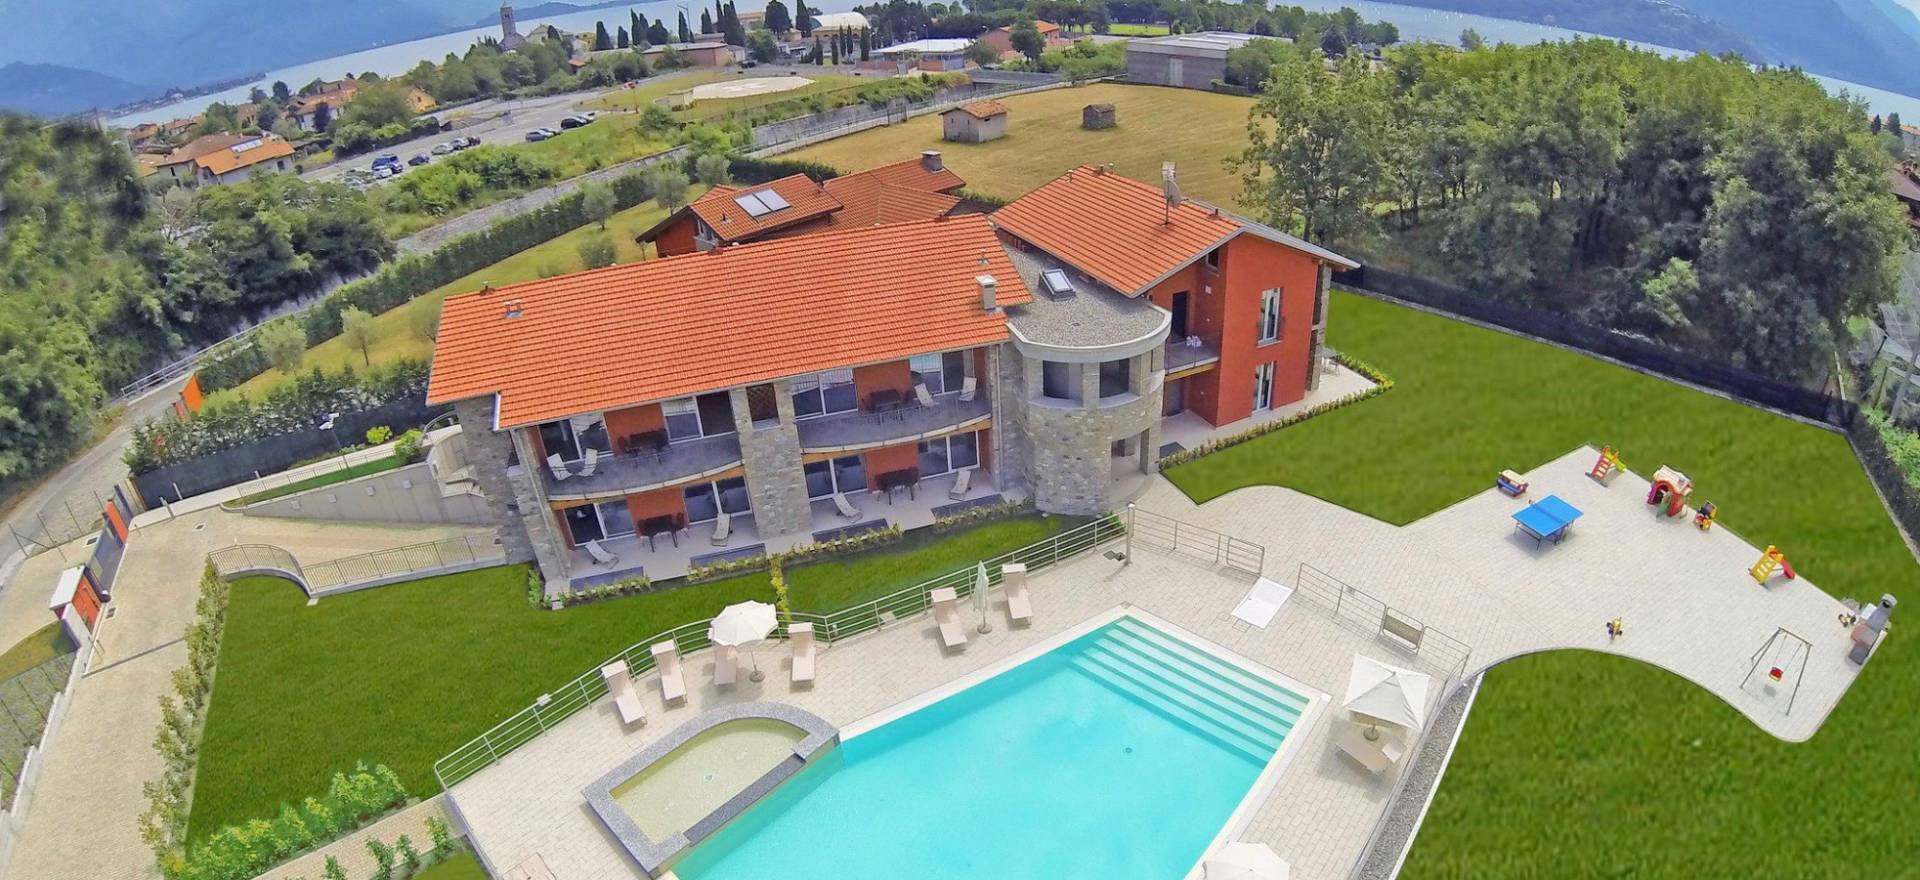 Agriturismo Lake Como and Lake Garda Residence Lake Como, child friendly and large pool